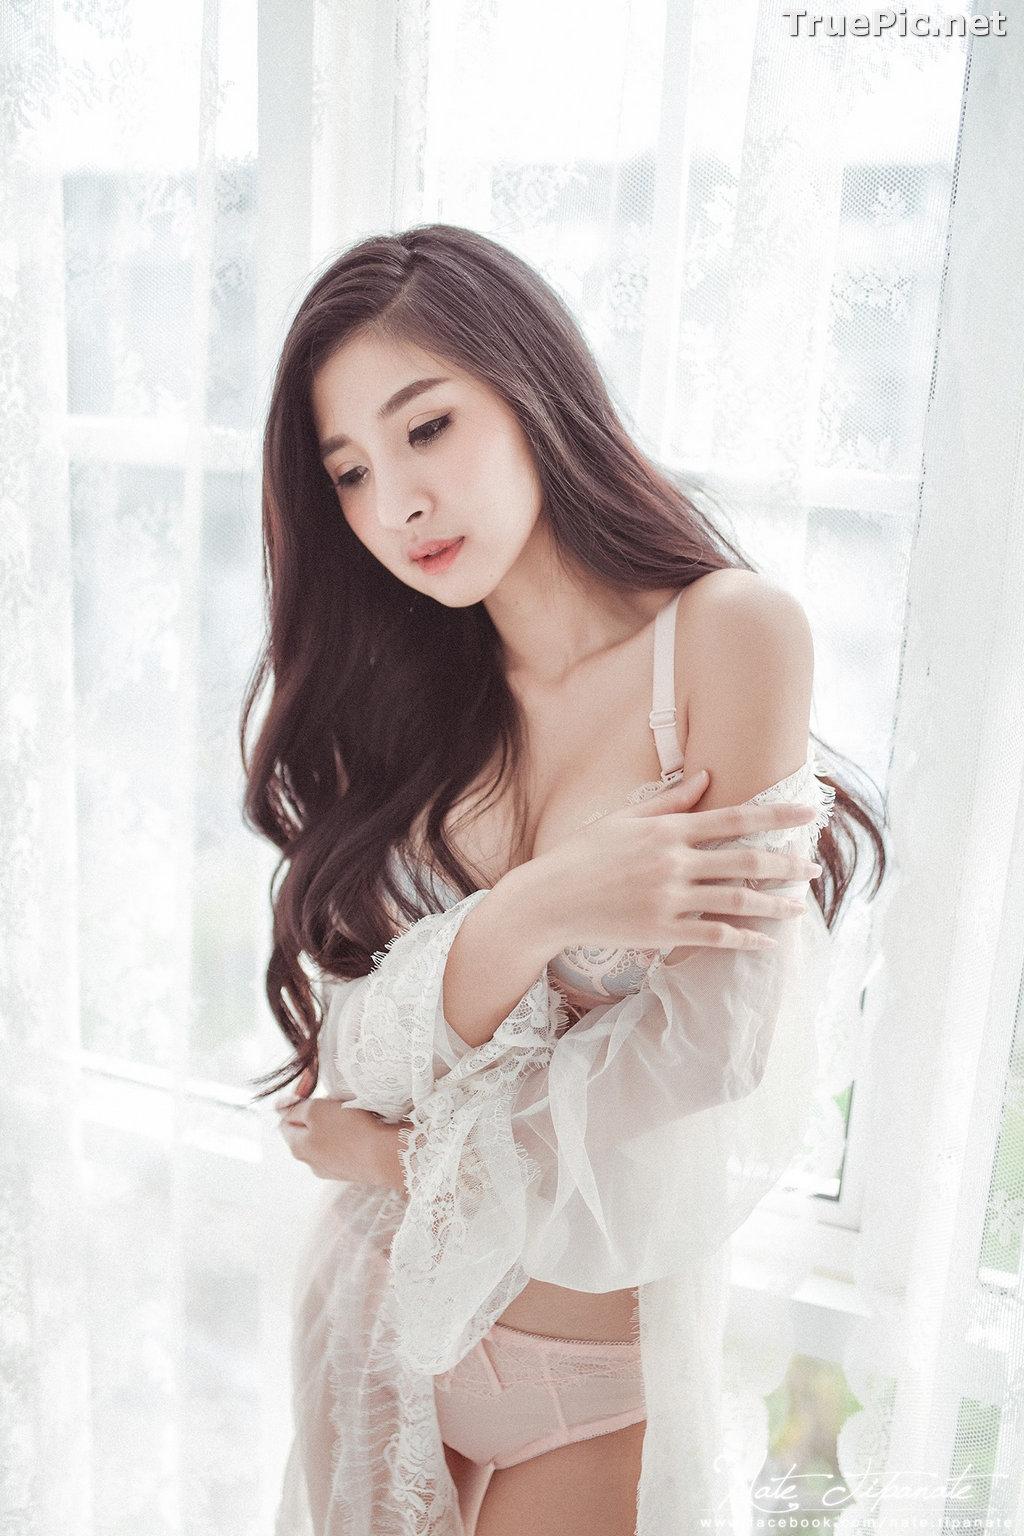 Image Thailand Model - Pattamaporn Keawkum - Sexy Sleepwear and Lingerie - TruePic.net - Picture-9